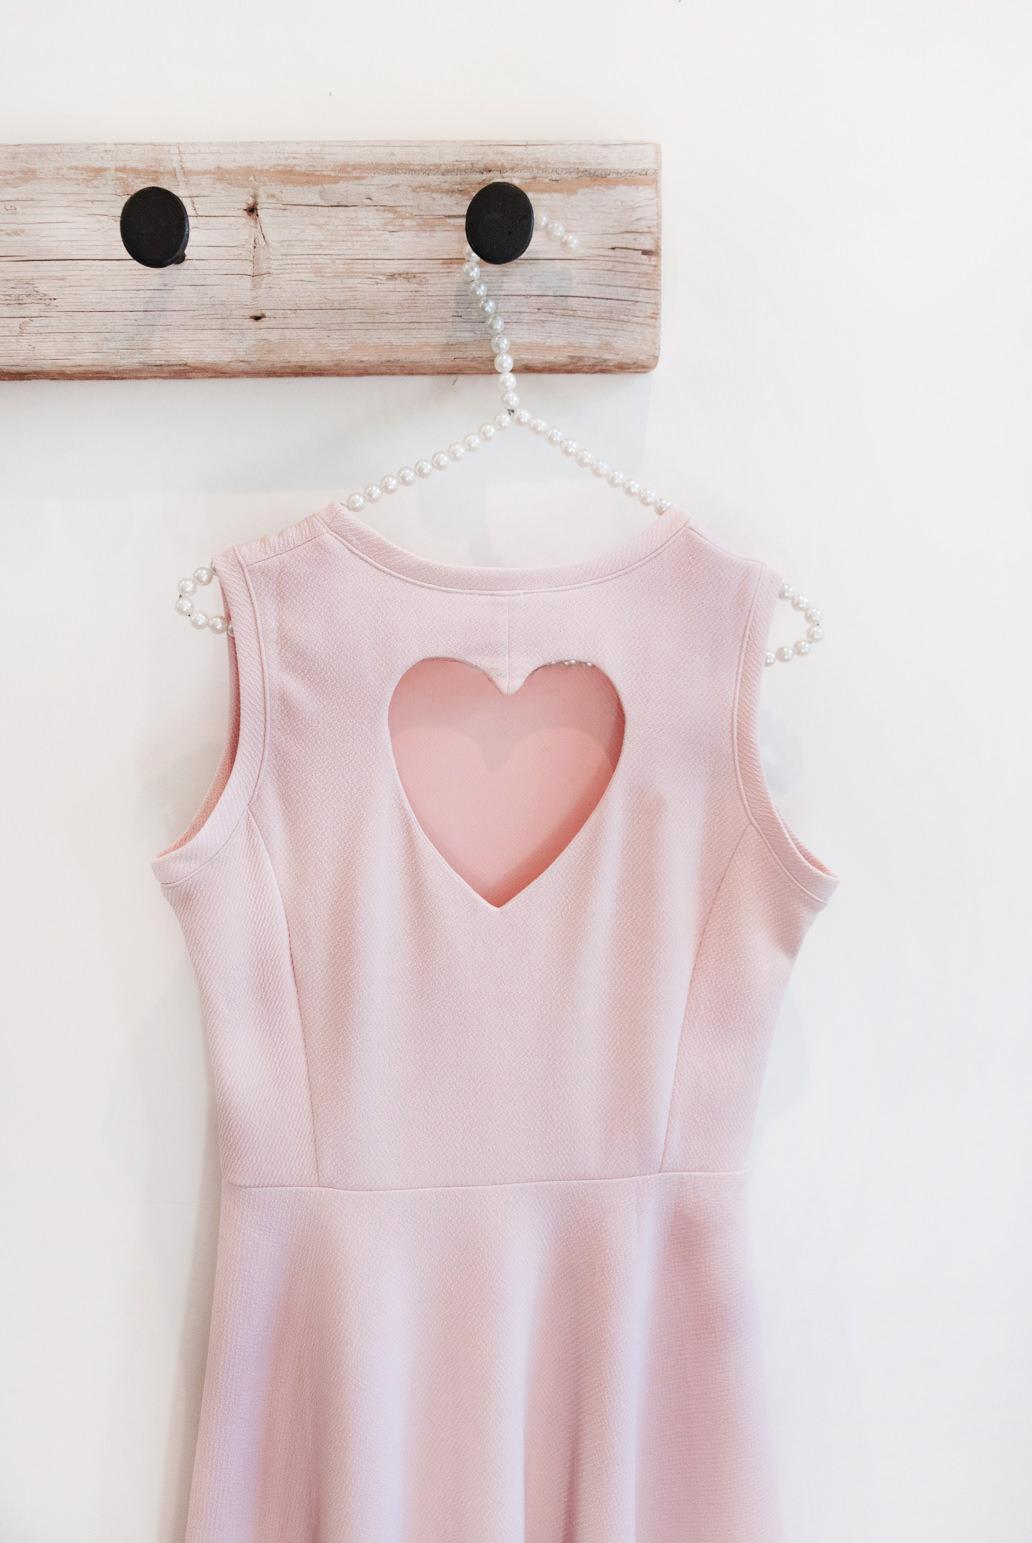 Blog-mode-And-The-City-Lifestyle-Cinq-Petites-Choses-214-robe-dos-coeur-LR